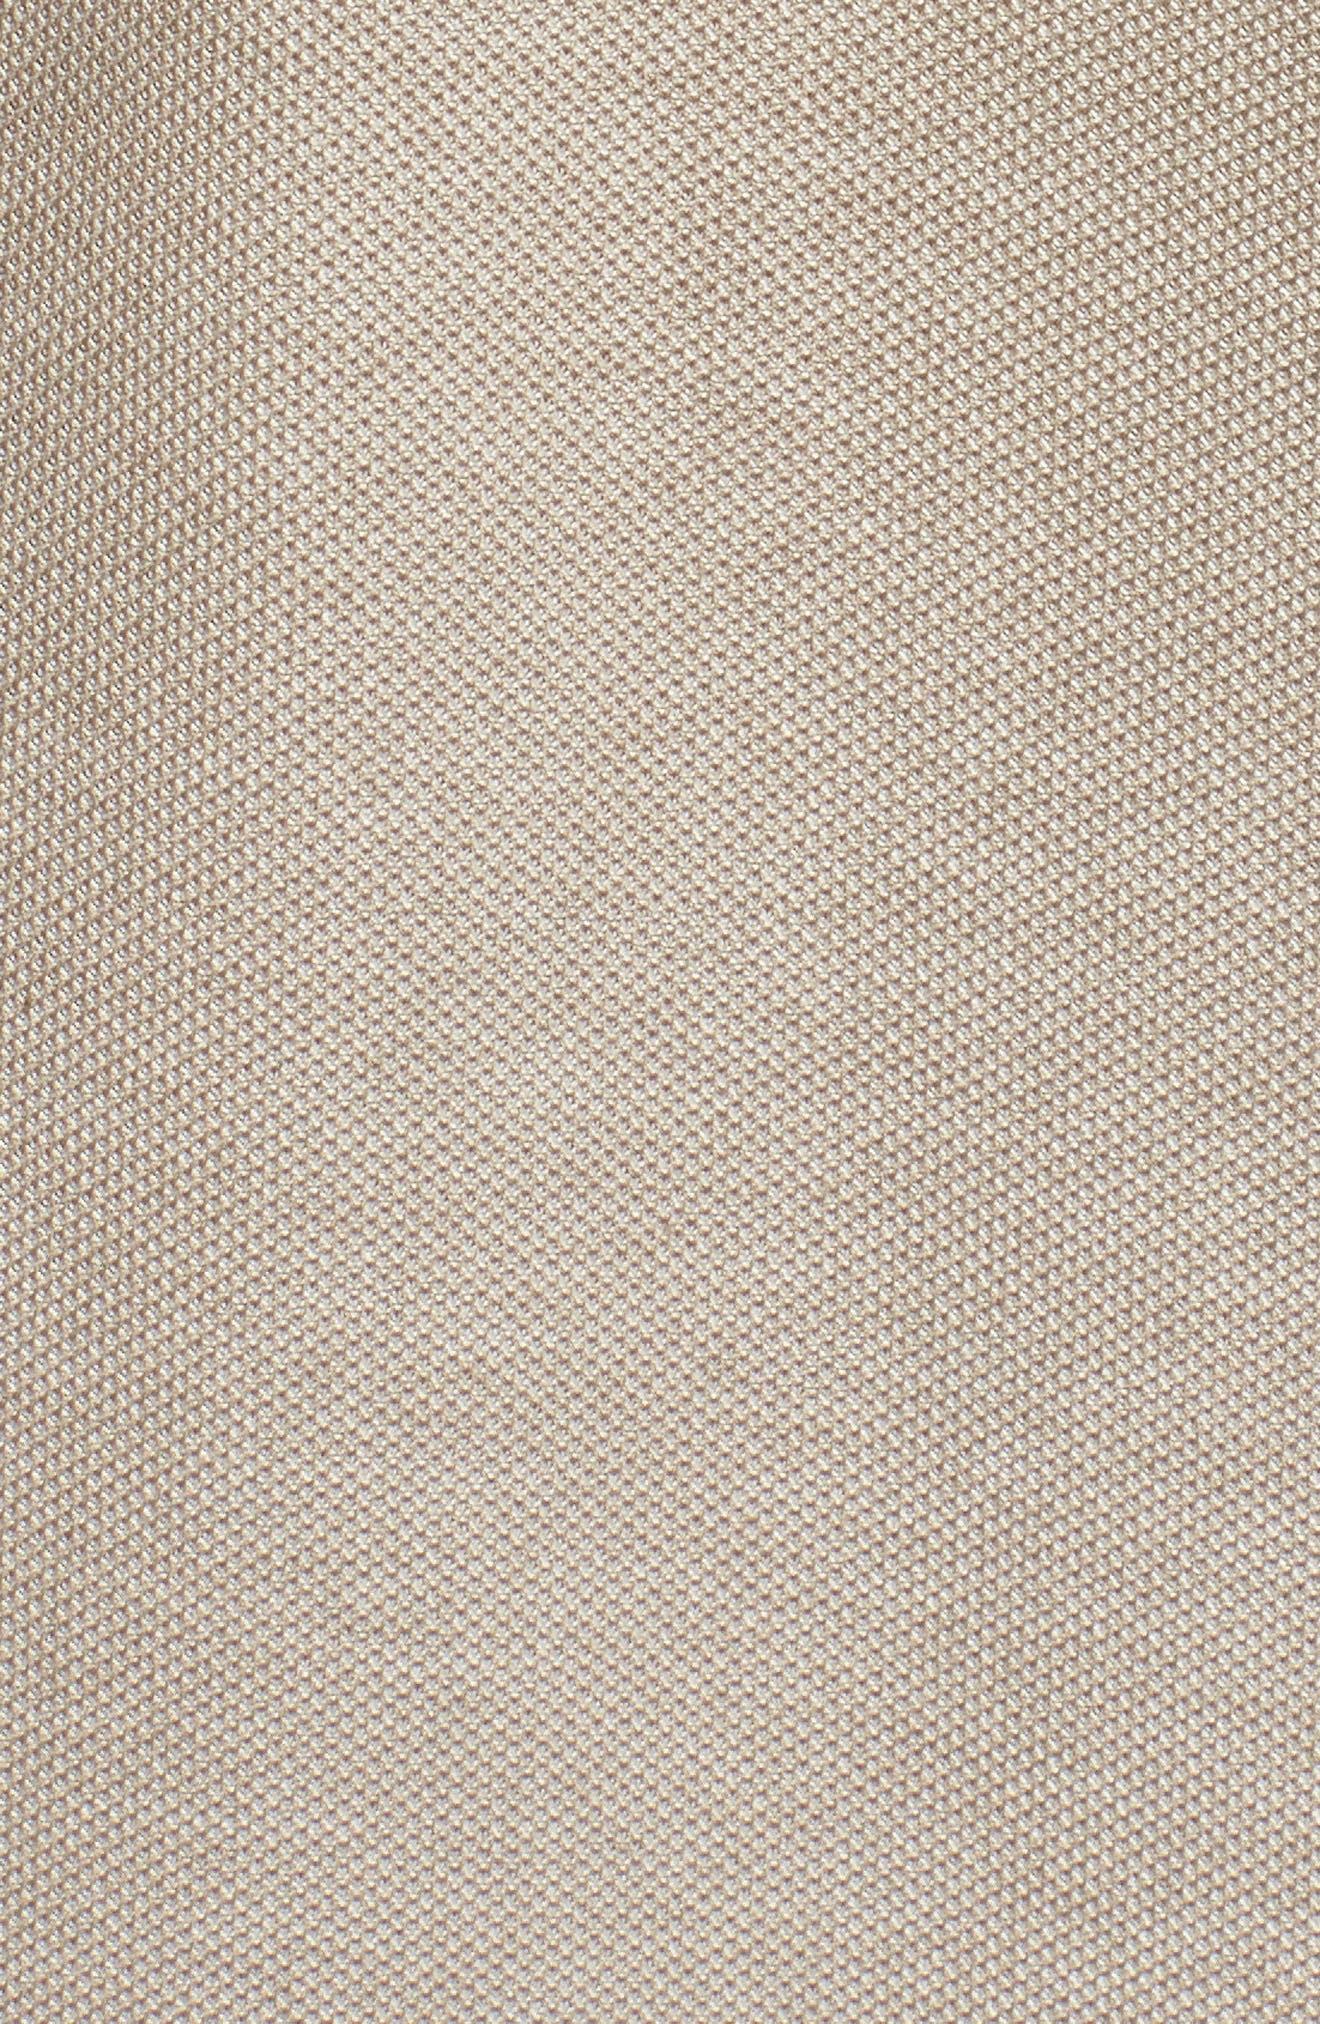 Cotton Polo Shirt,                             Alternate thumbnail 5, color,                             Tan